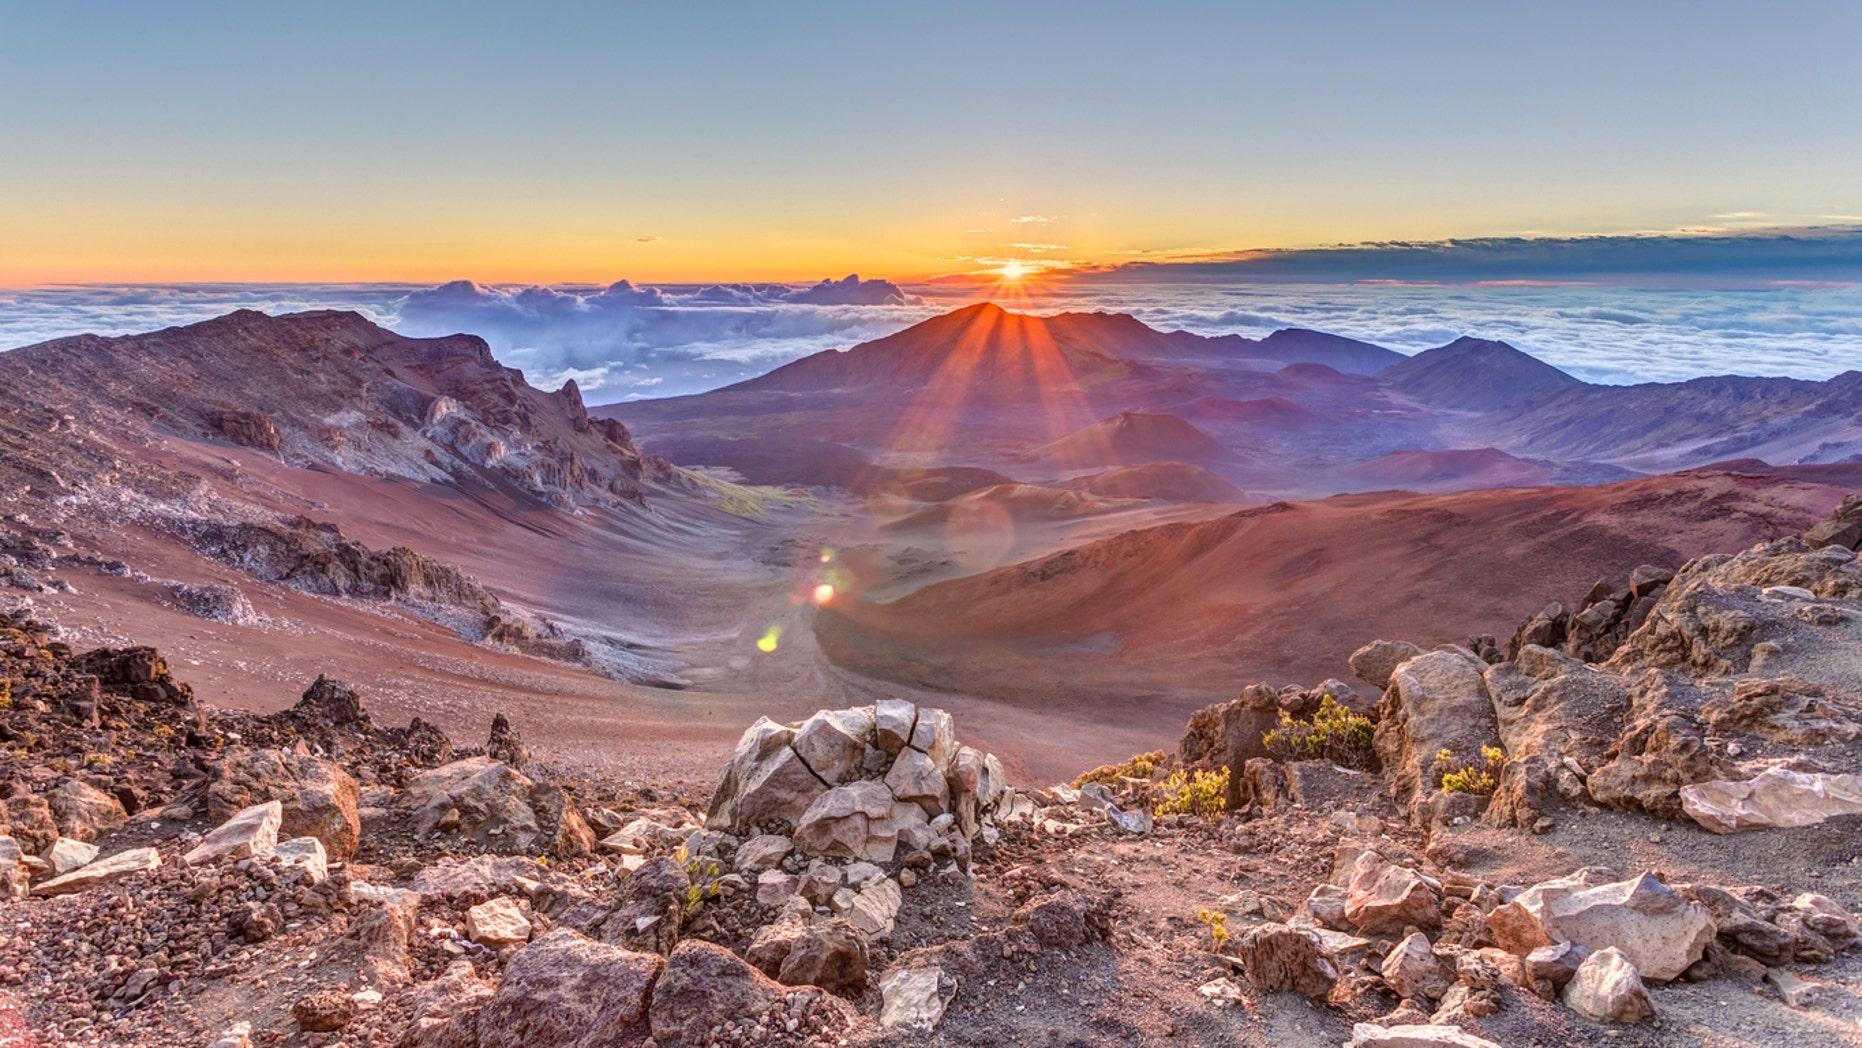 Sunrise from the summit of Haleakala volcano on the tropical island of Maui, Hawaii.